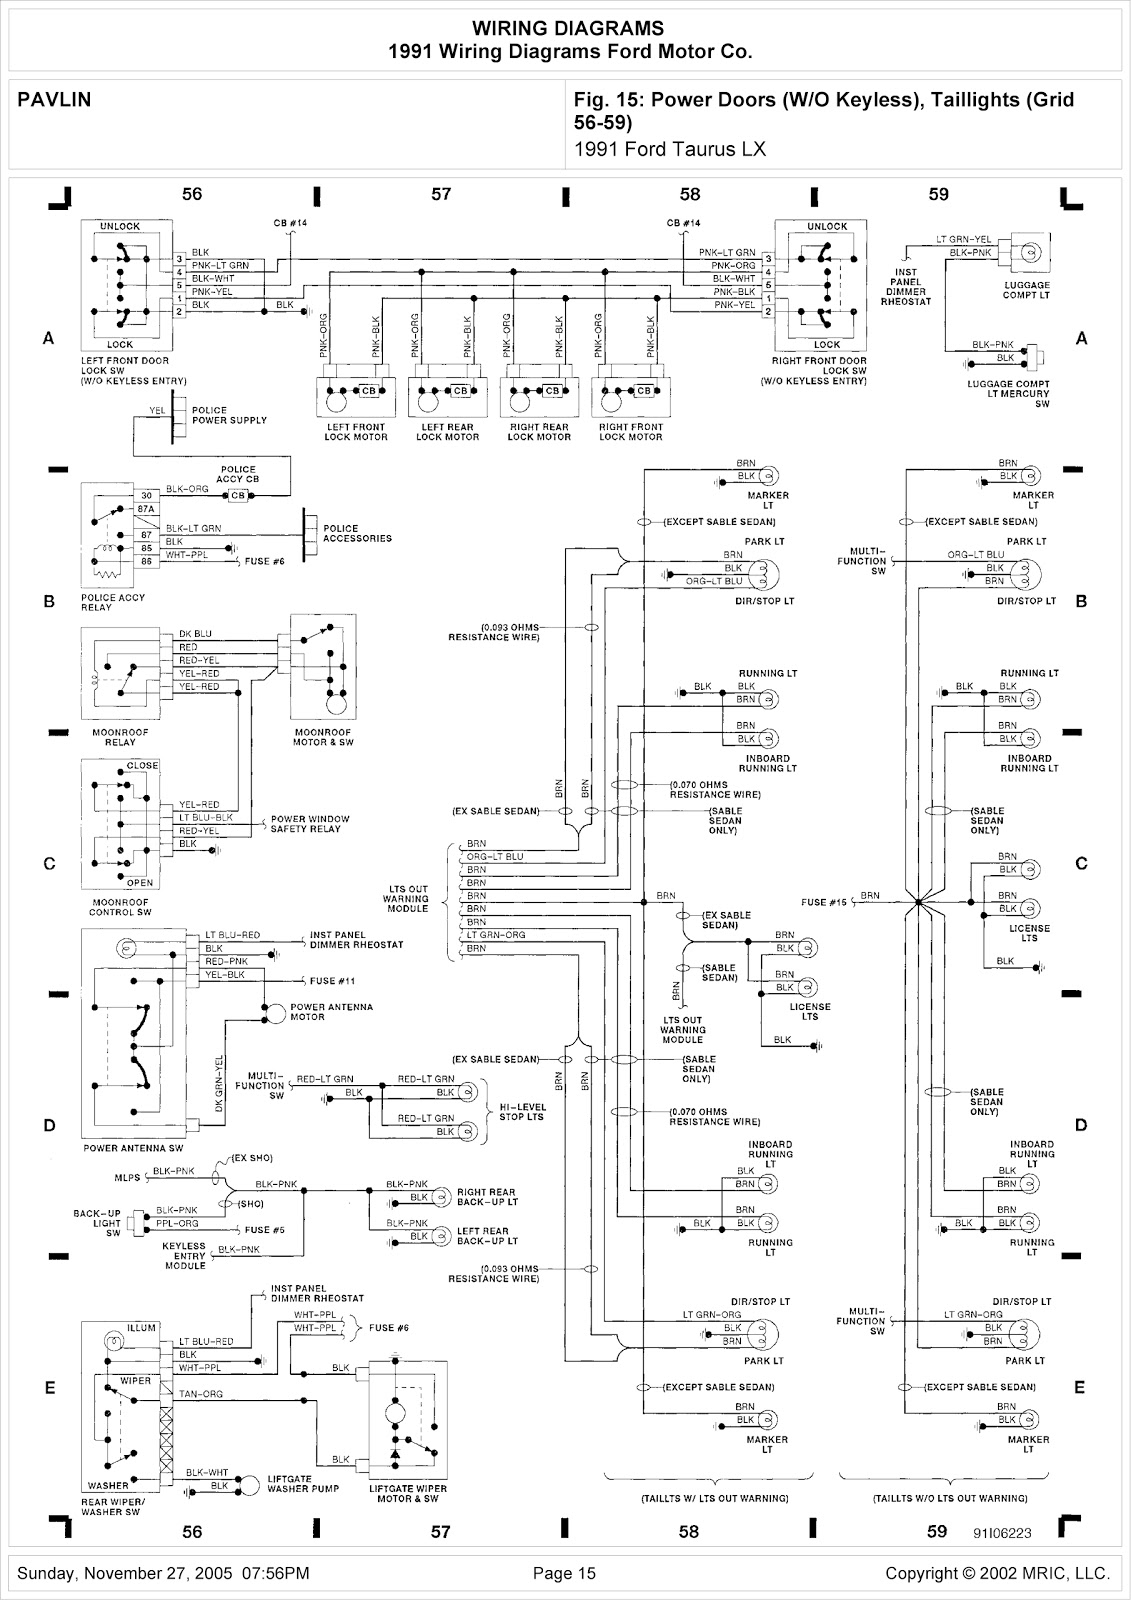 medium resolution of 2000 ford taurus fuse box diagram 2000 ford taurus diagram 2000 ford taurus wiring diagram 2000